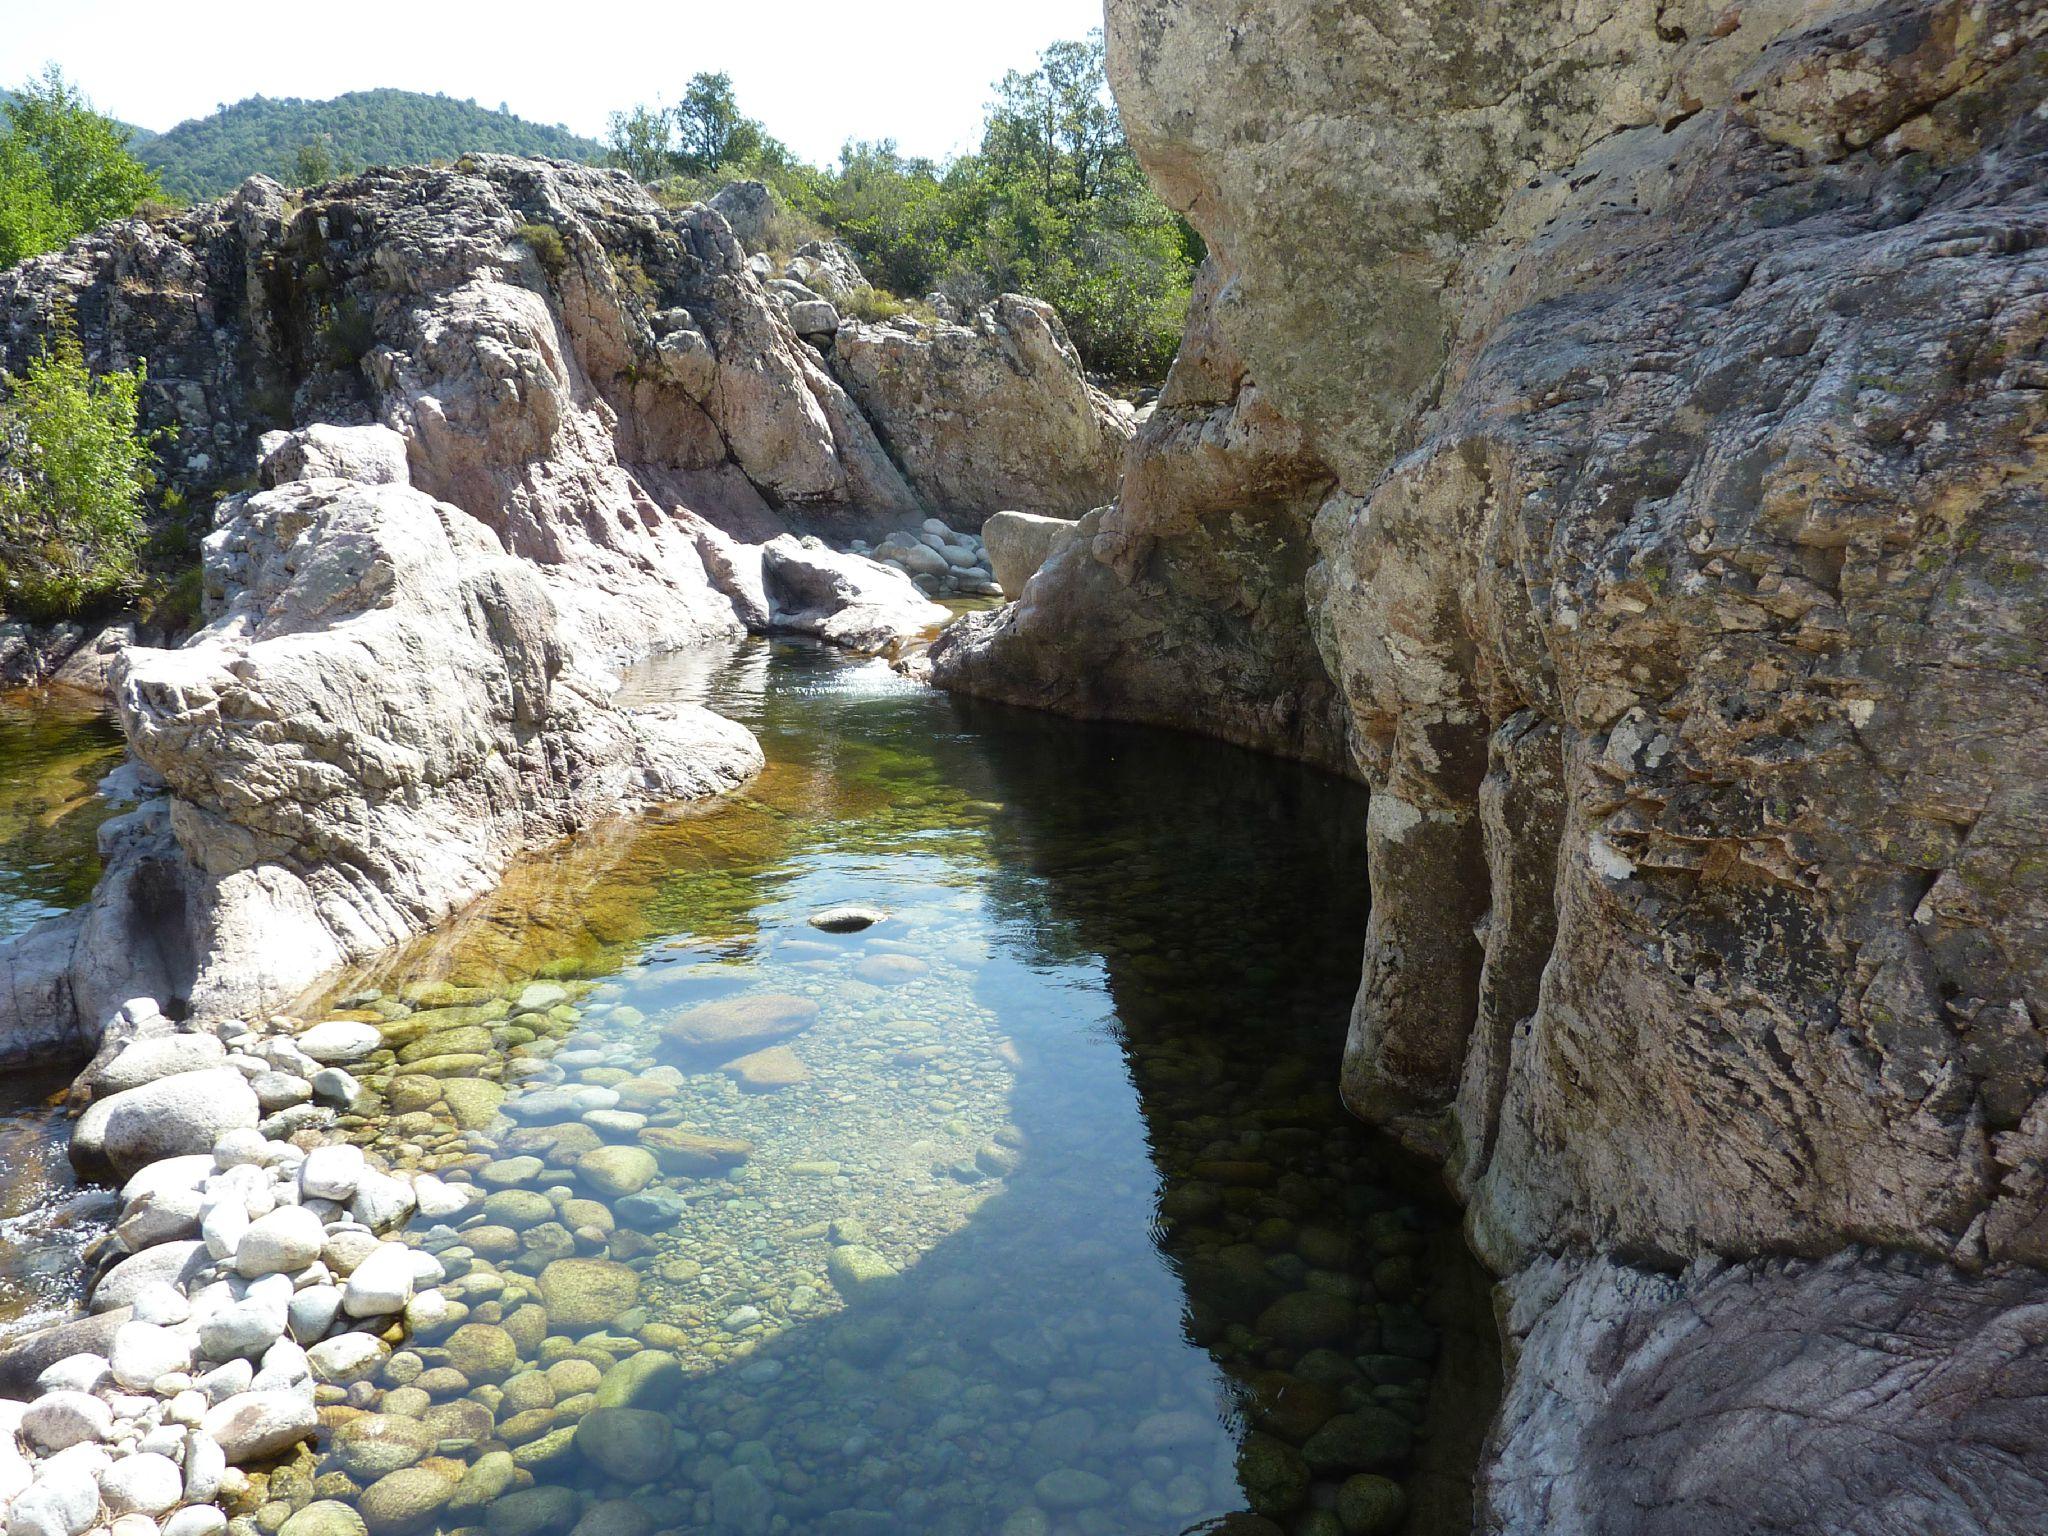 Guagno les bains bebetricot for Thalasso bain les bains